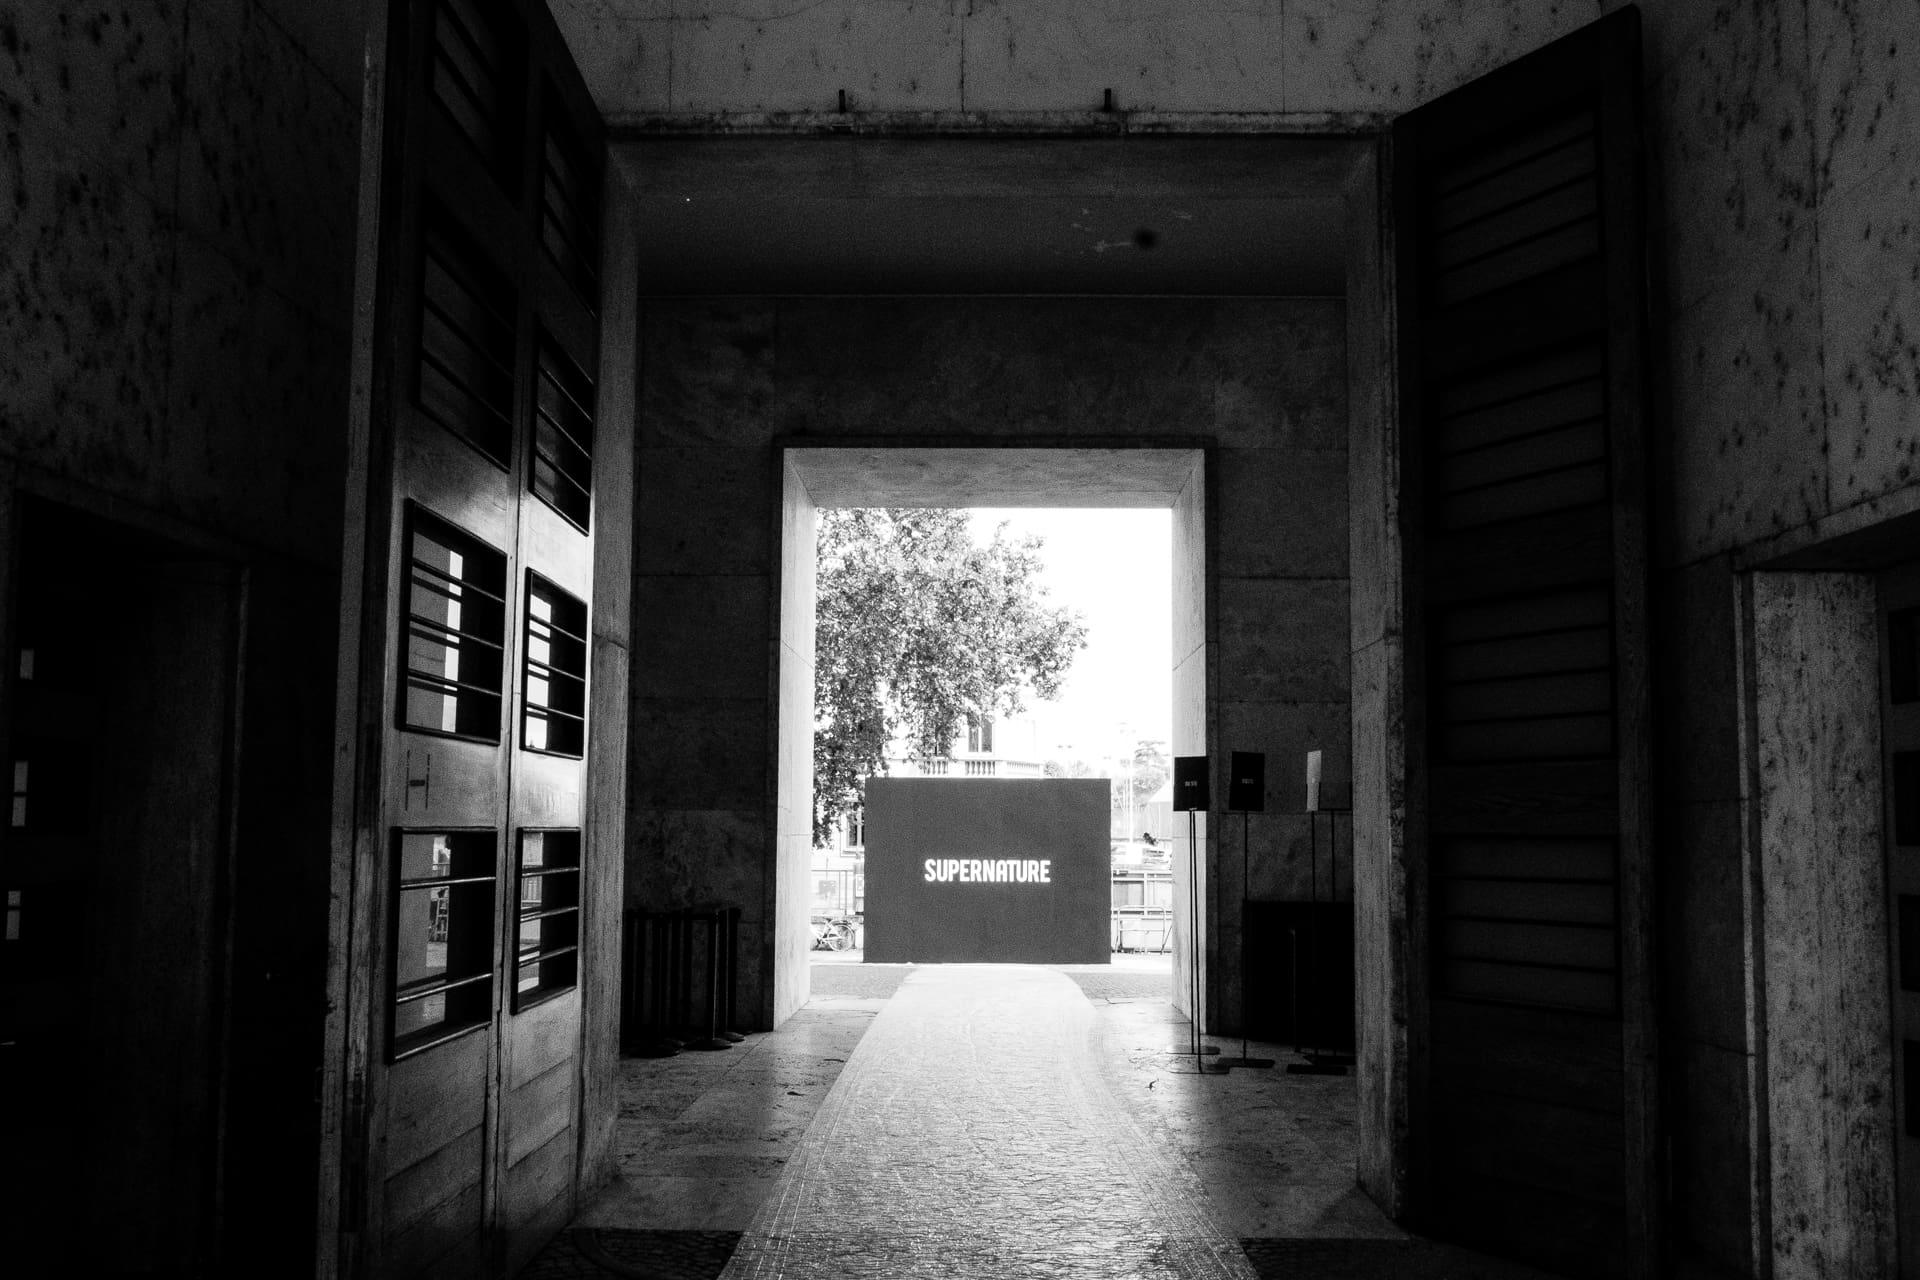 06 Supernature Polimoda 2019©federicafioravanti 57